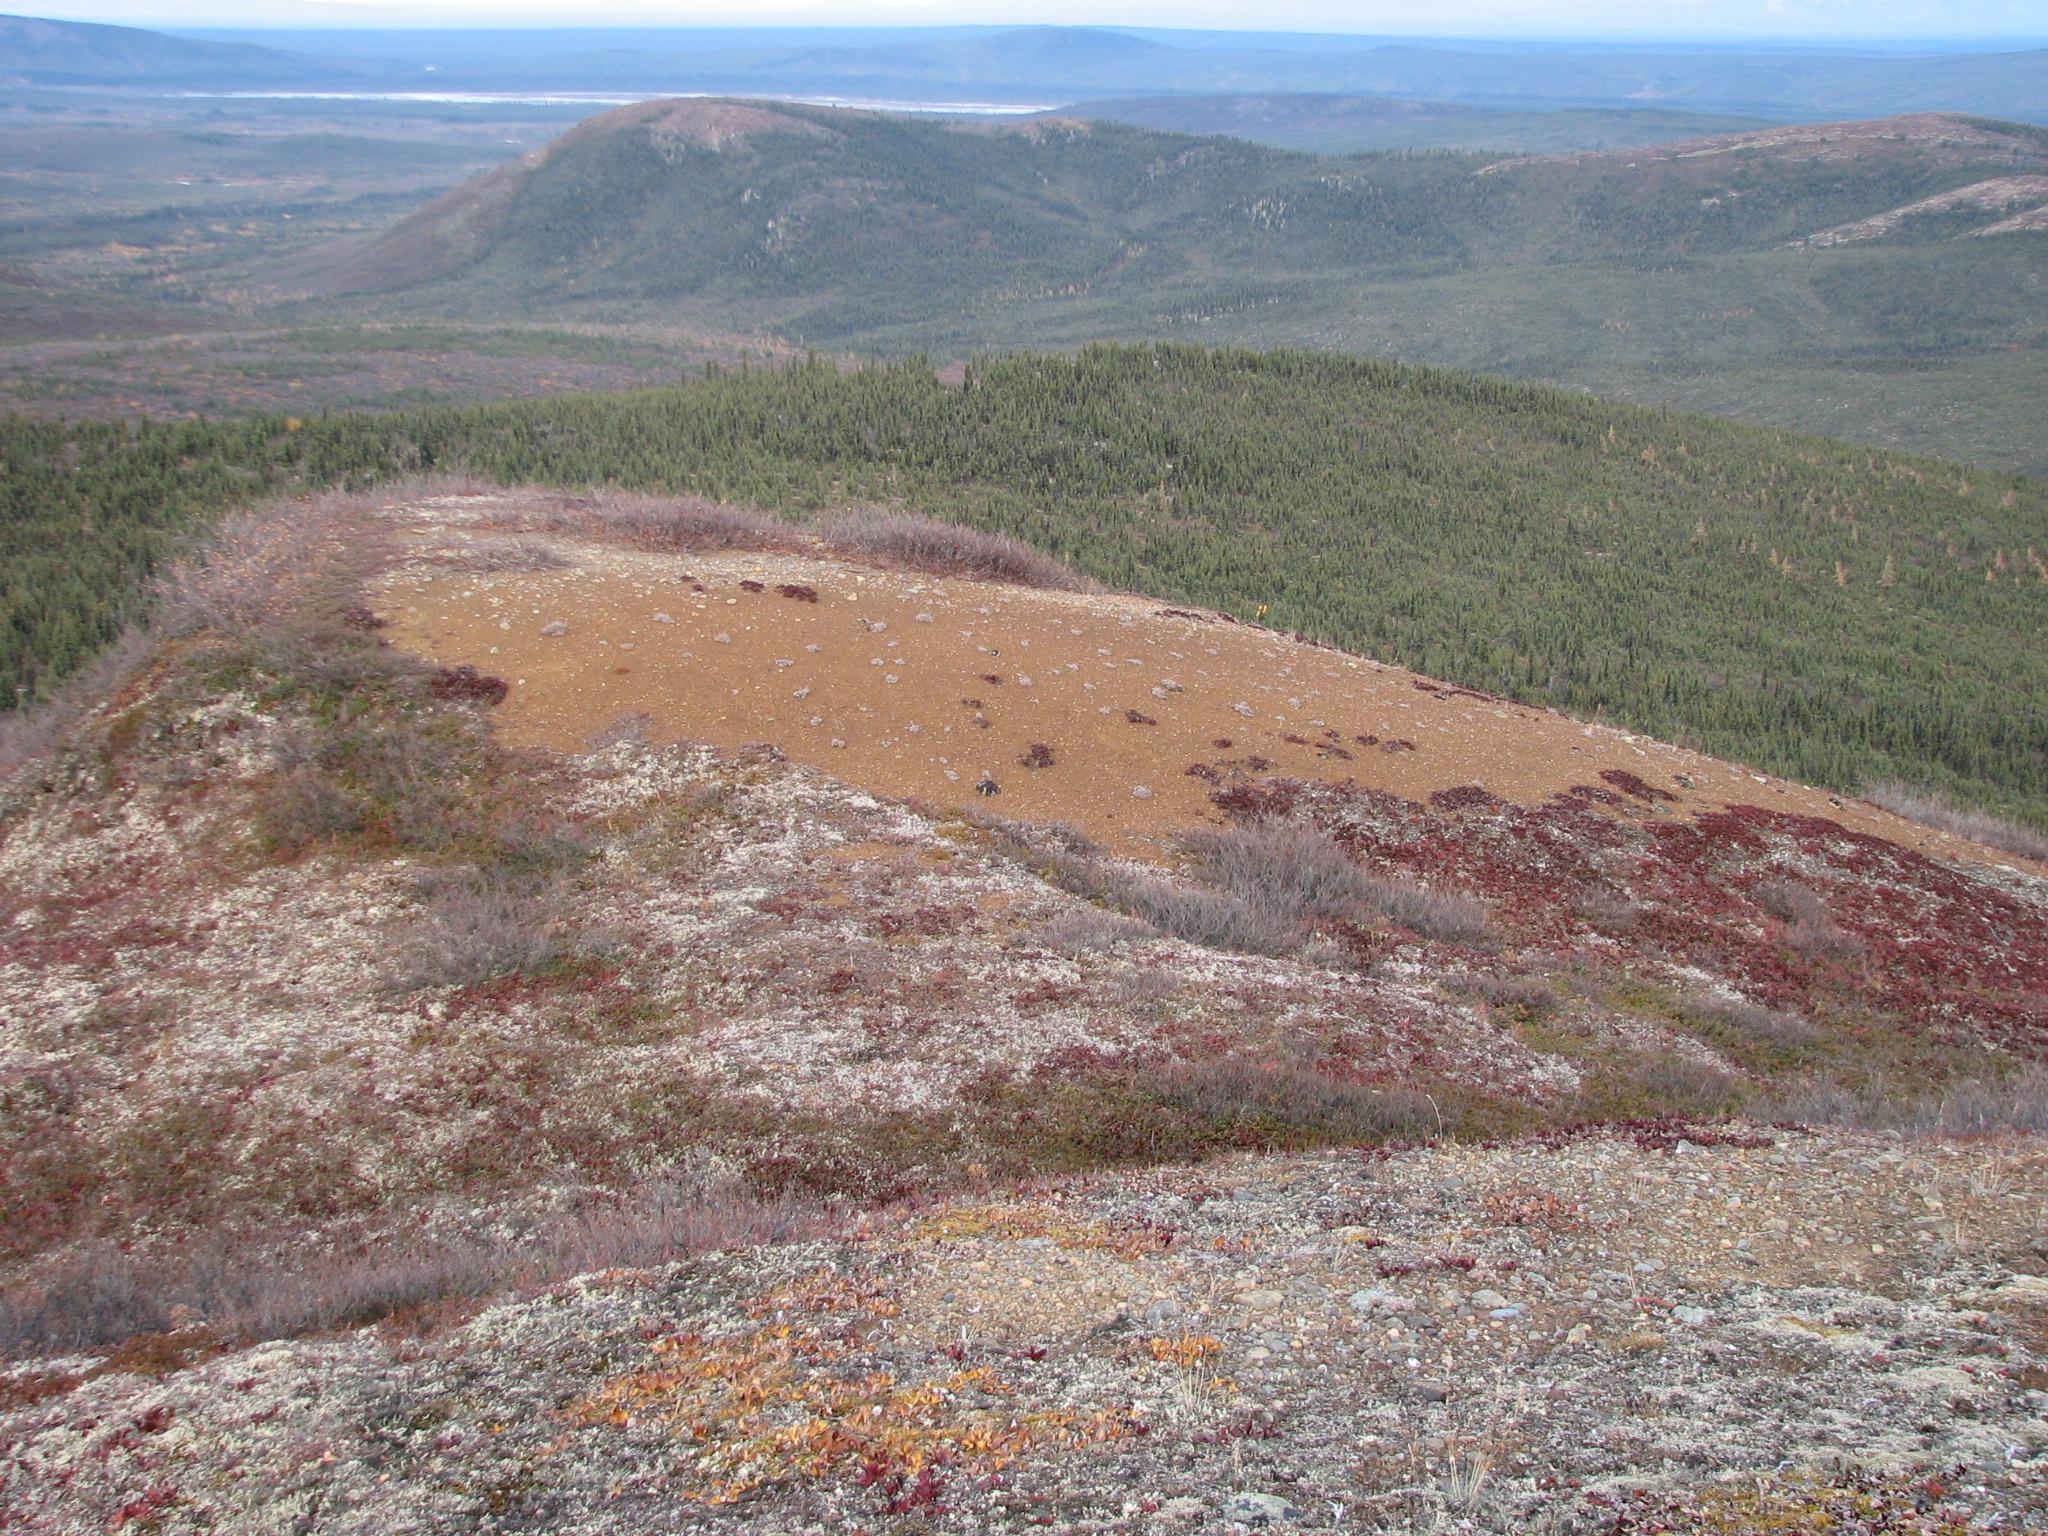 Yukon: Land with visible gossan containing silver, led, zinc, and manganese.